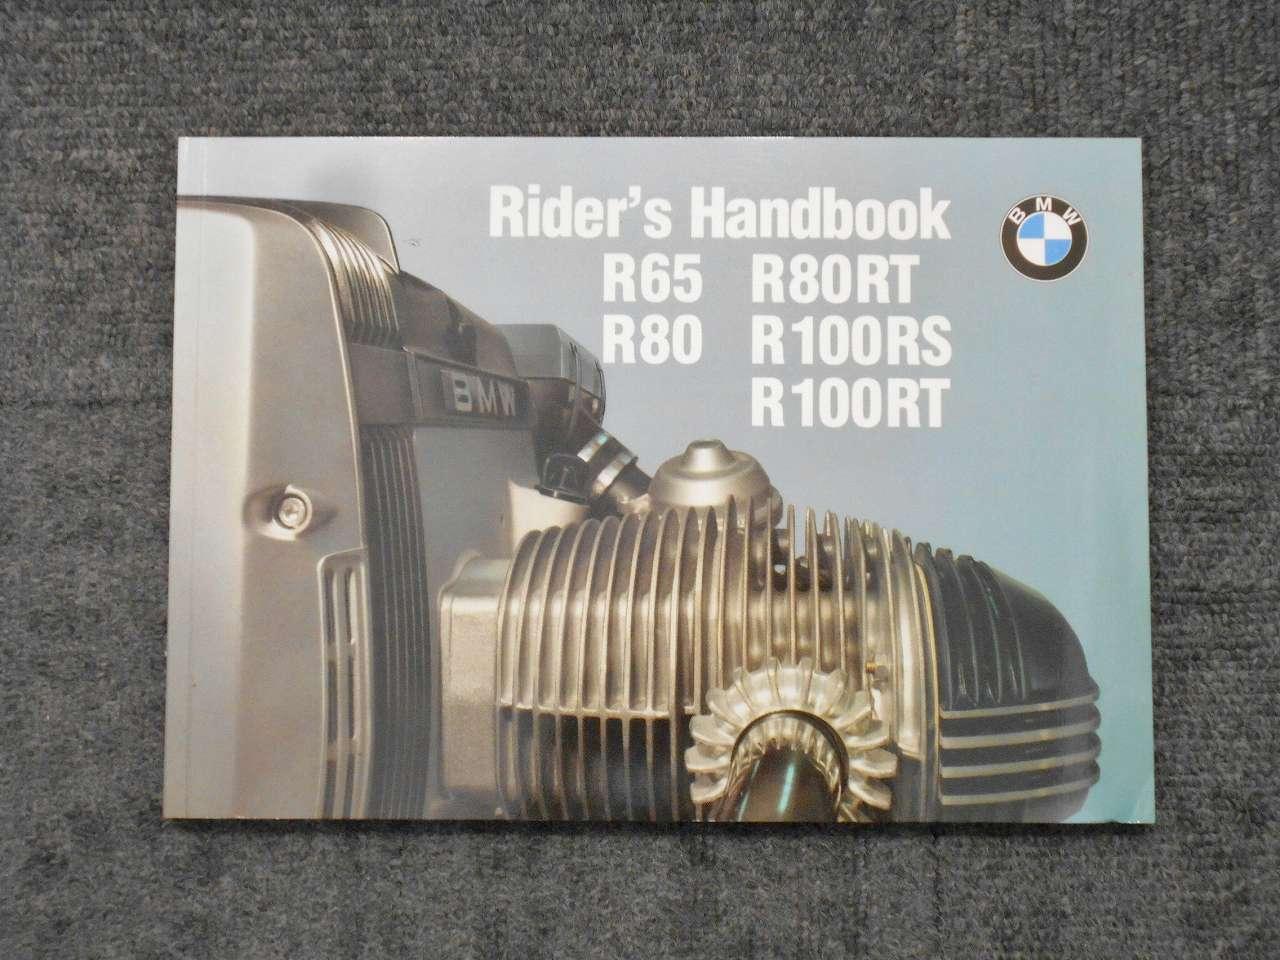 BMW純正 新車時付属の車輛取扱説明書 R65.R80.R80RT.R100T.R100RS.R100RT用